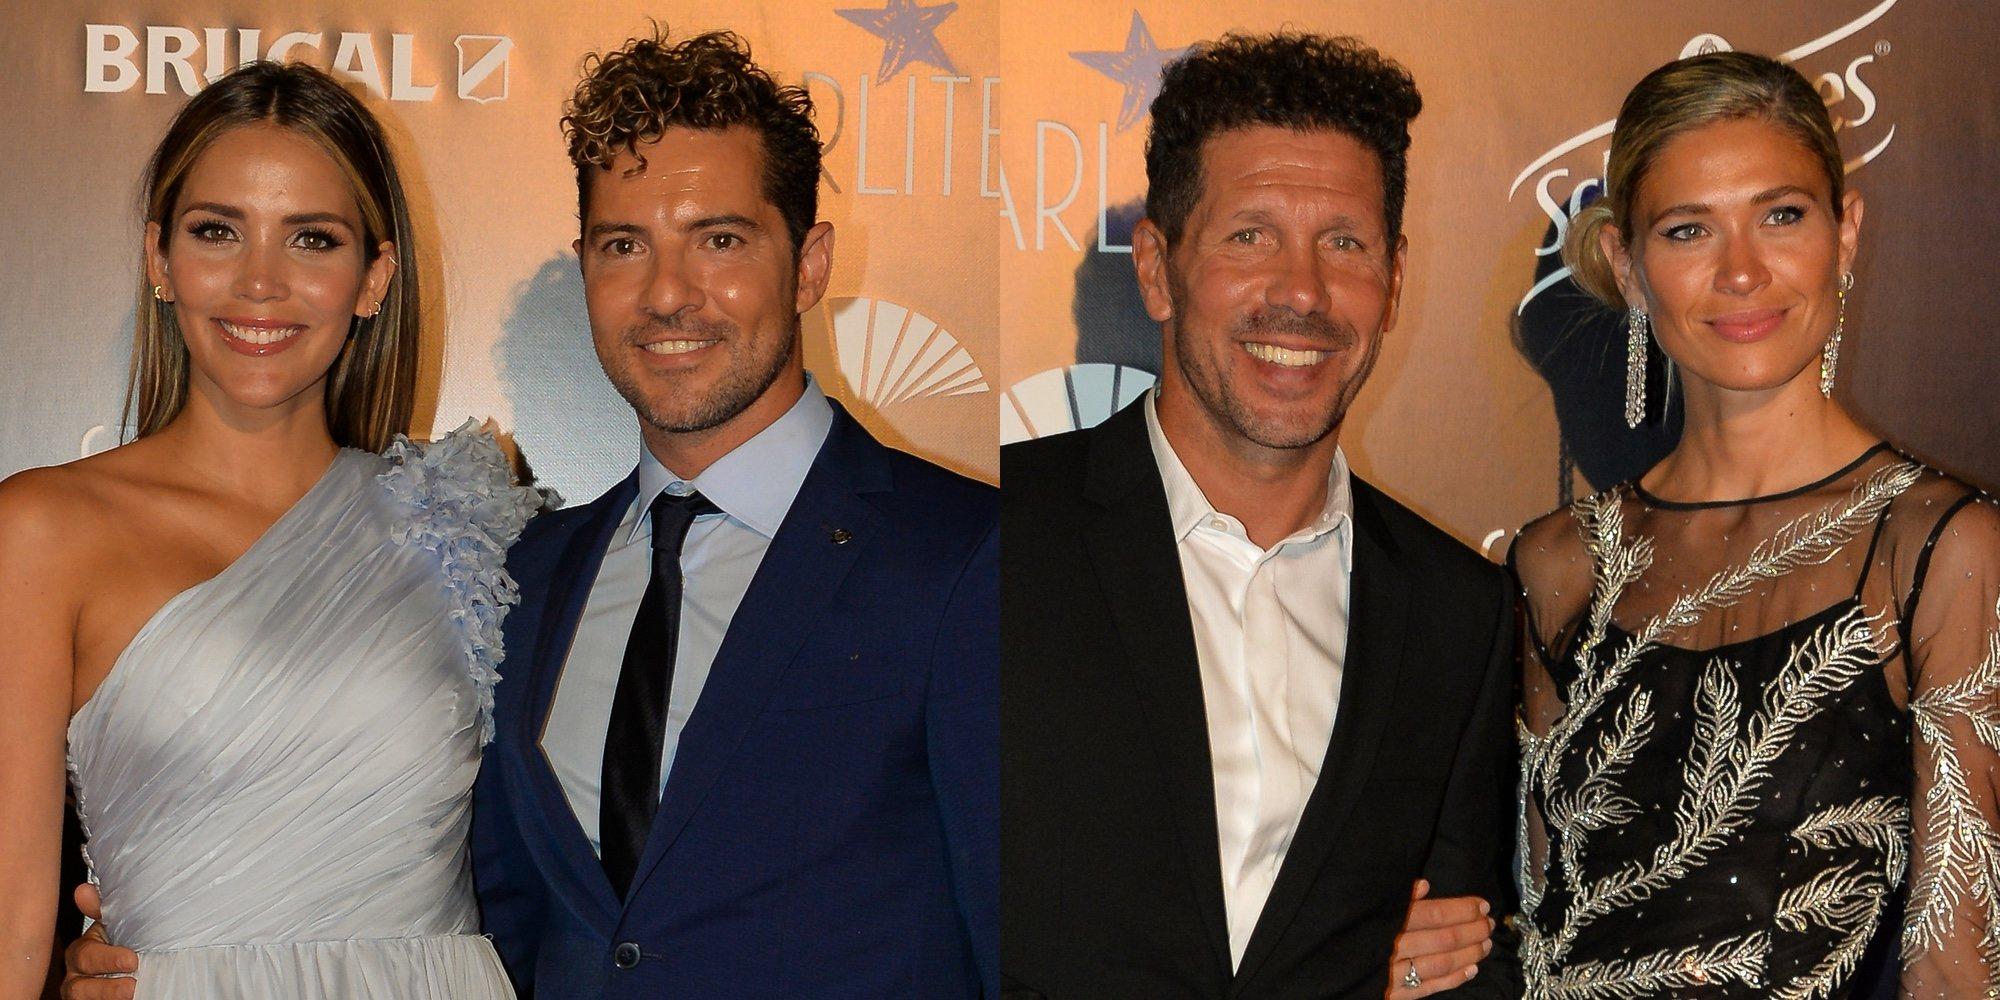 Rosanna Zanetti, David Bisbal, Diego Simeone o Carla Pereyra consiguen brillar en la Gala Starlite 2019